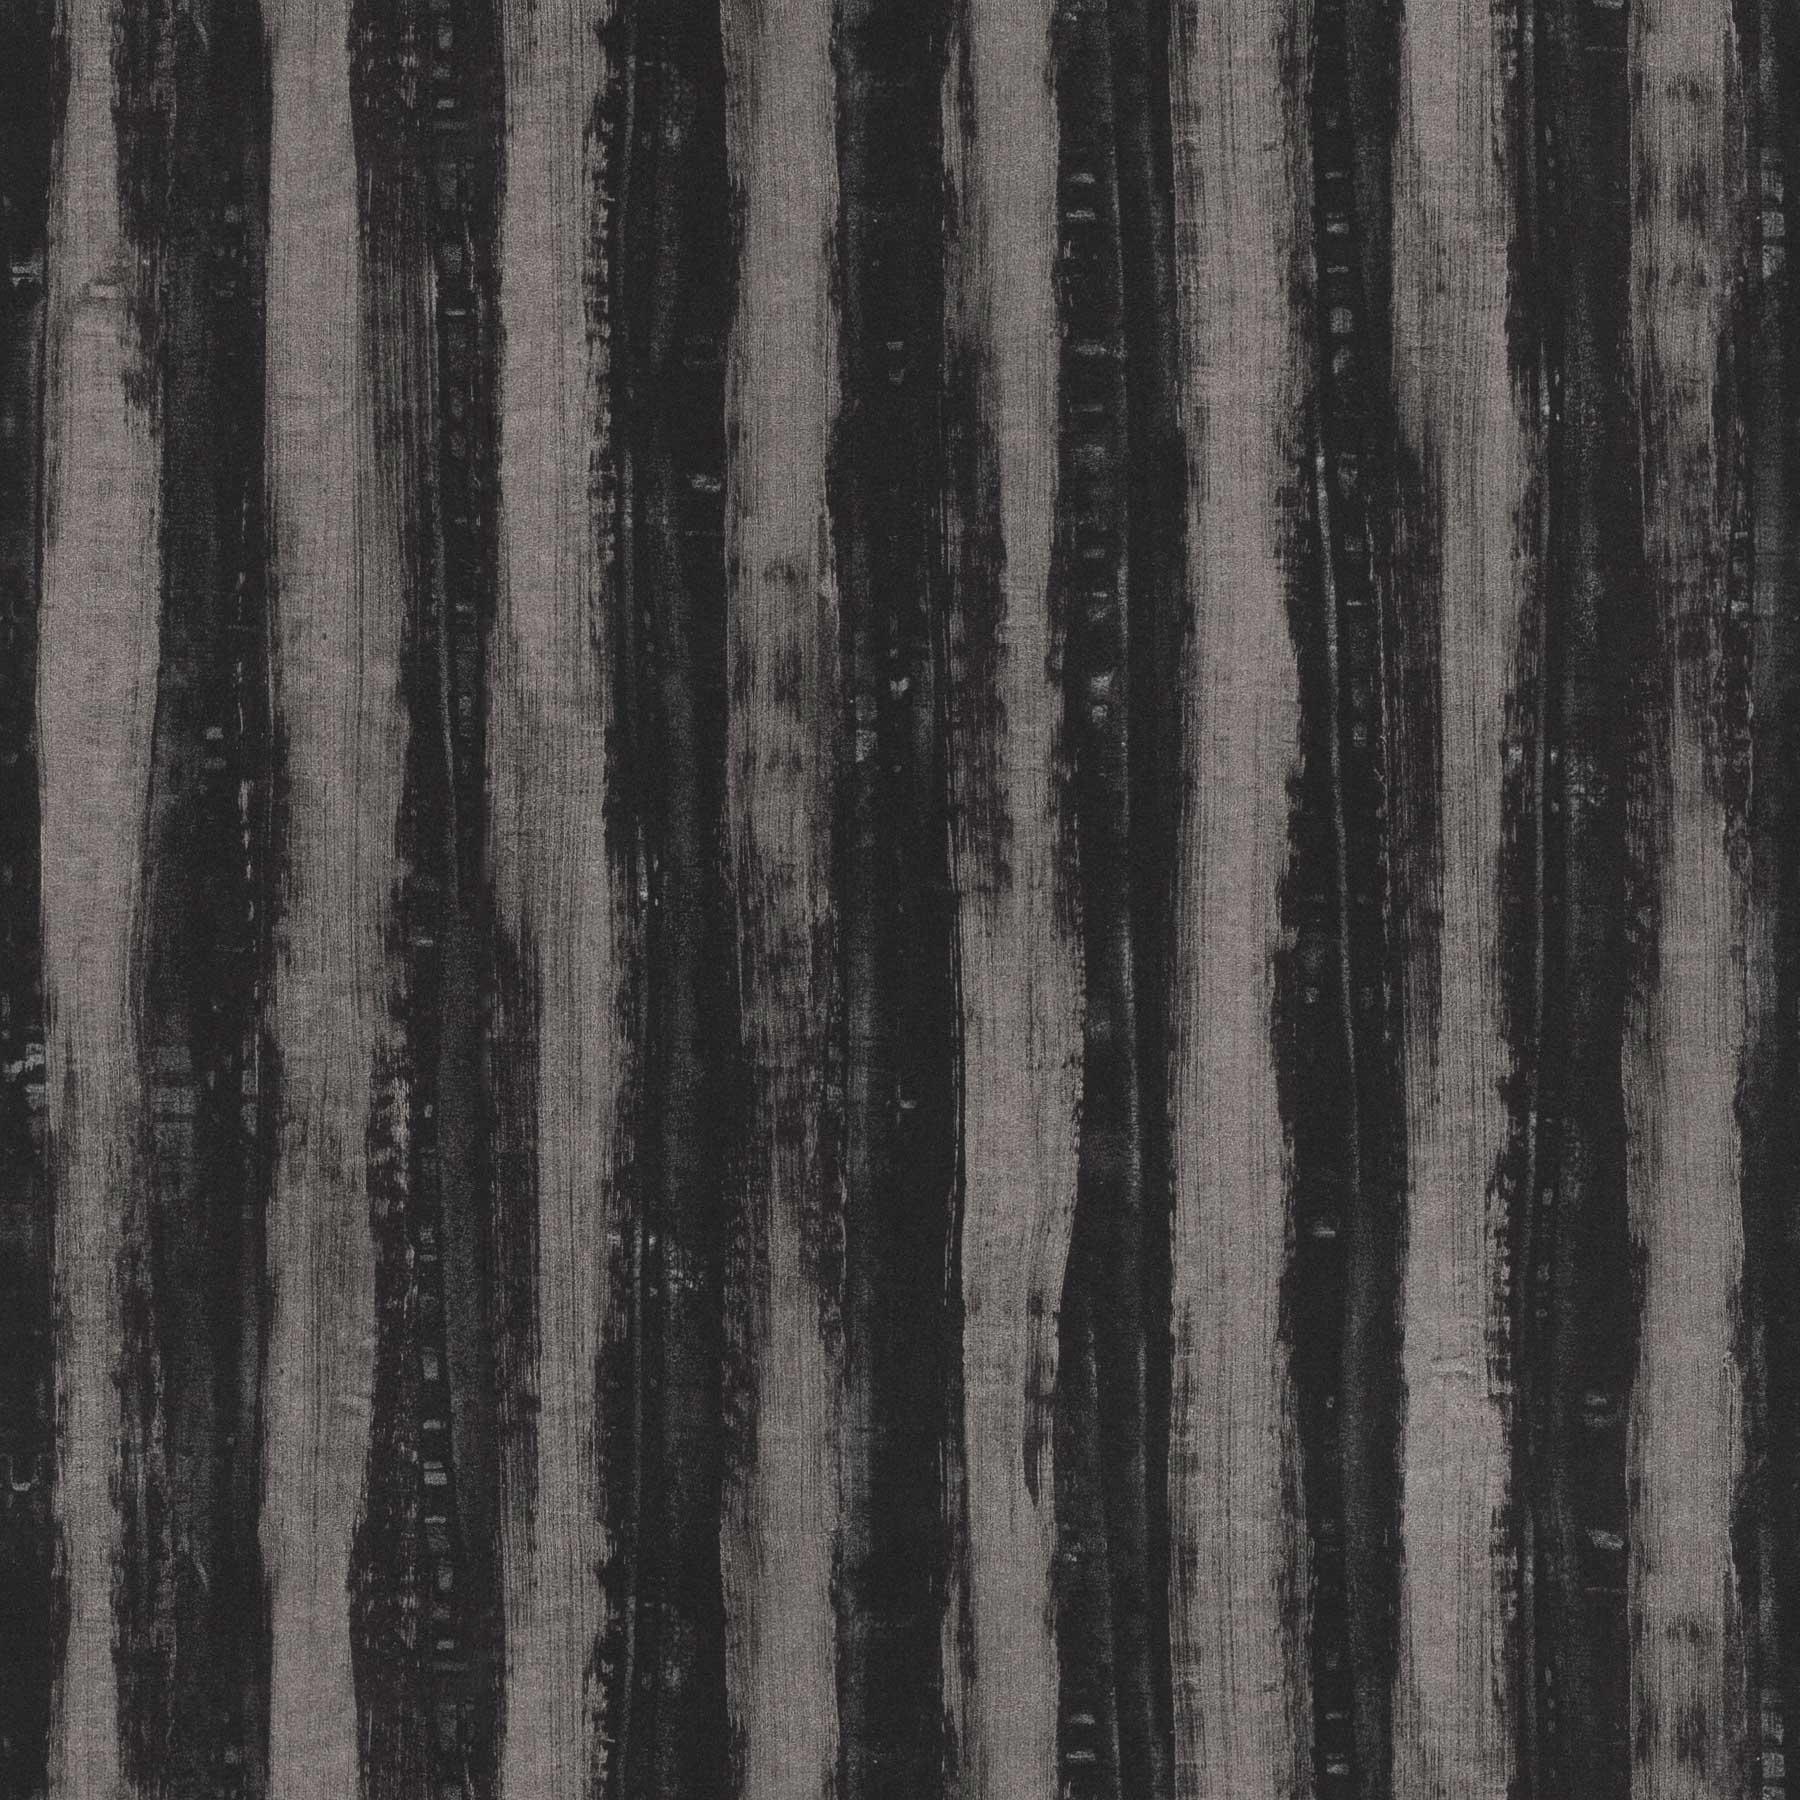 Maler Buban – Tapete SPLENDID STRIPES / JAB